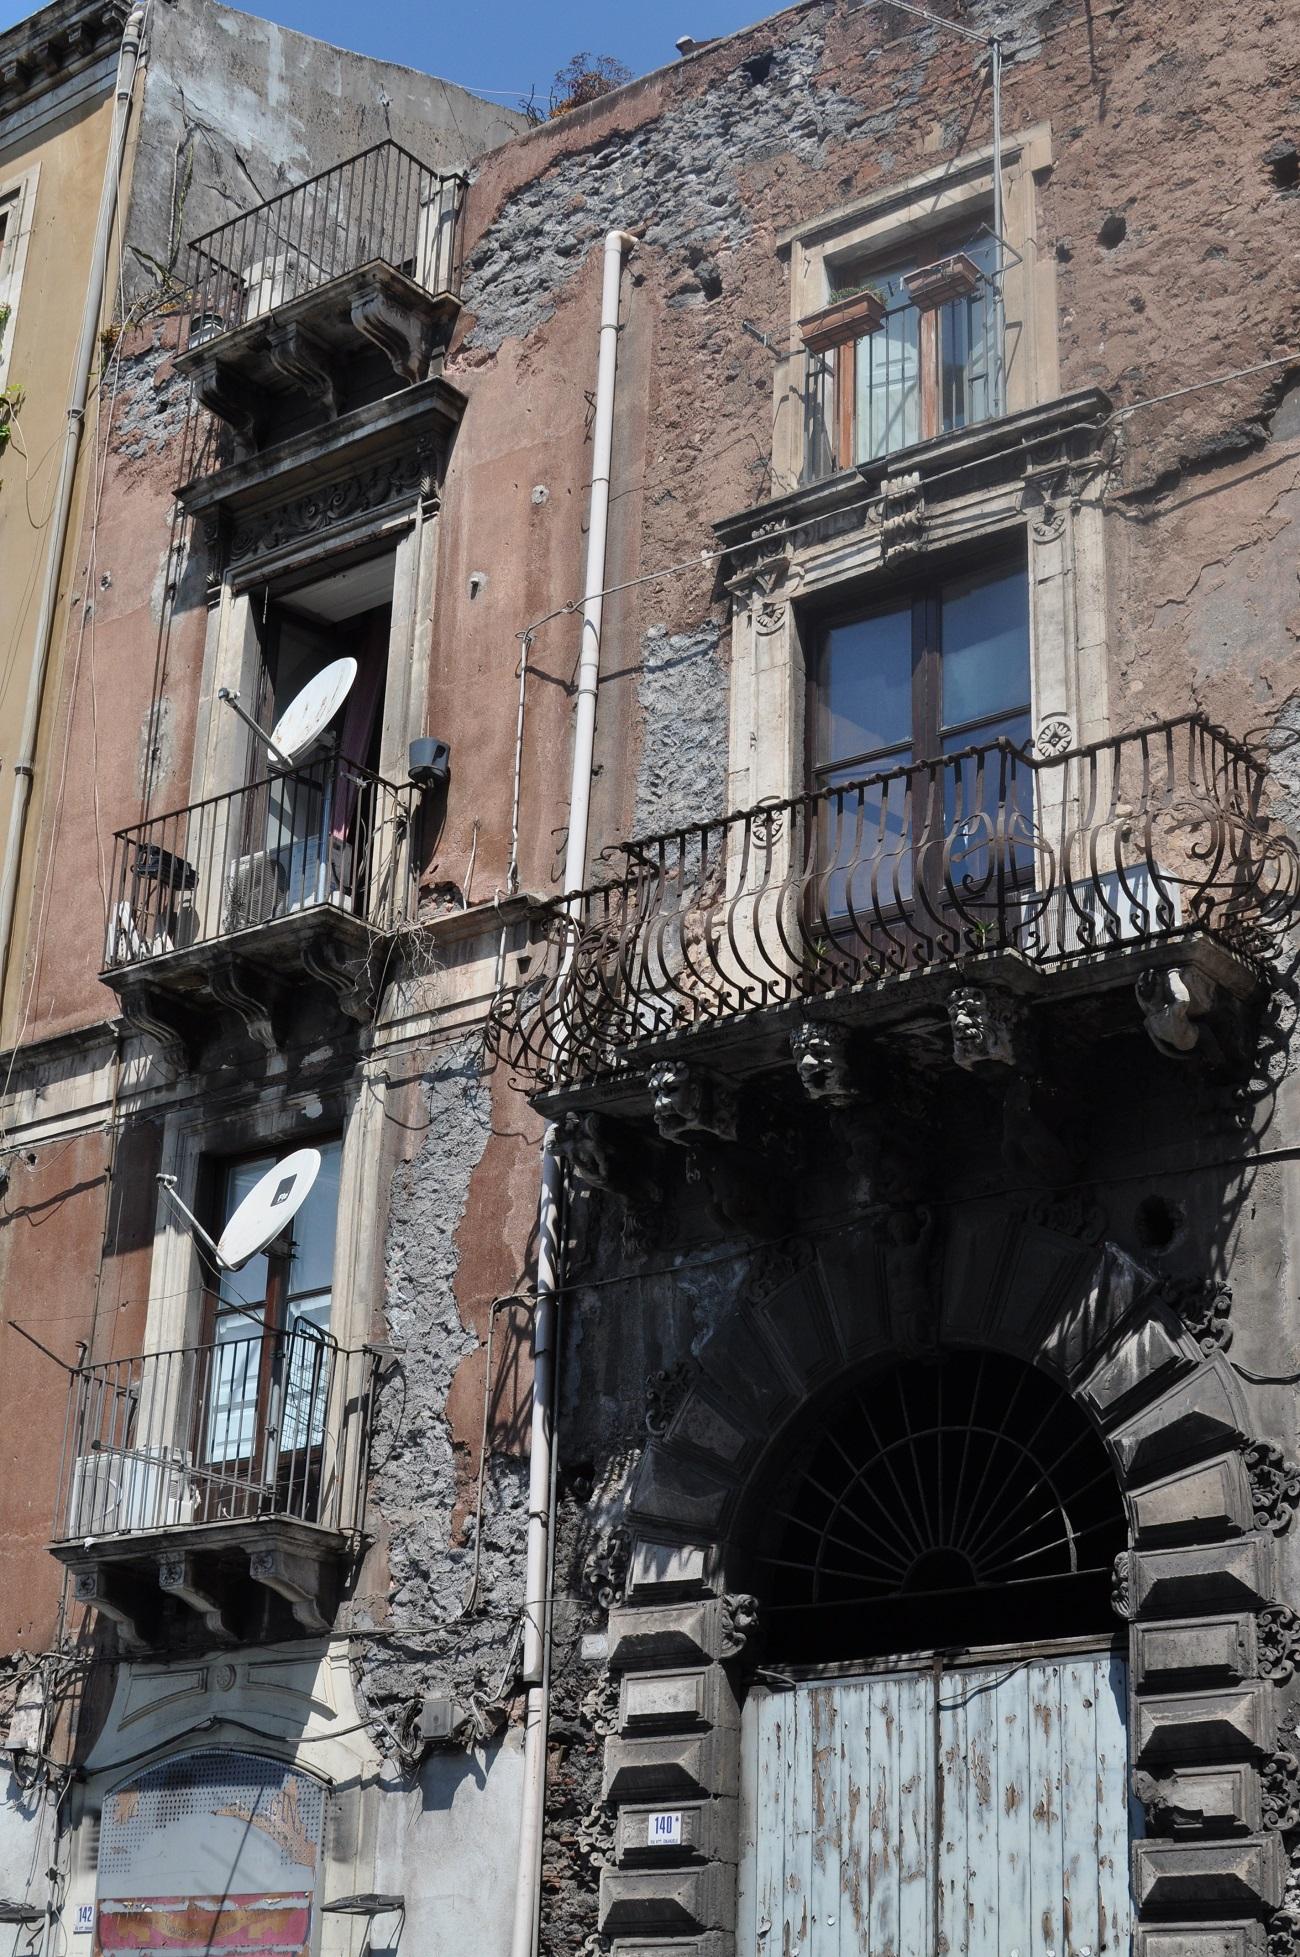 rocaille-blog-catania-sicilia-orientale-tour-25